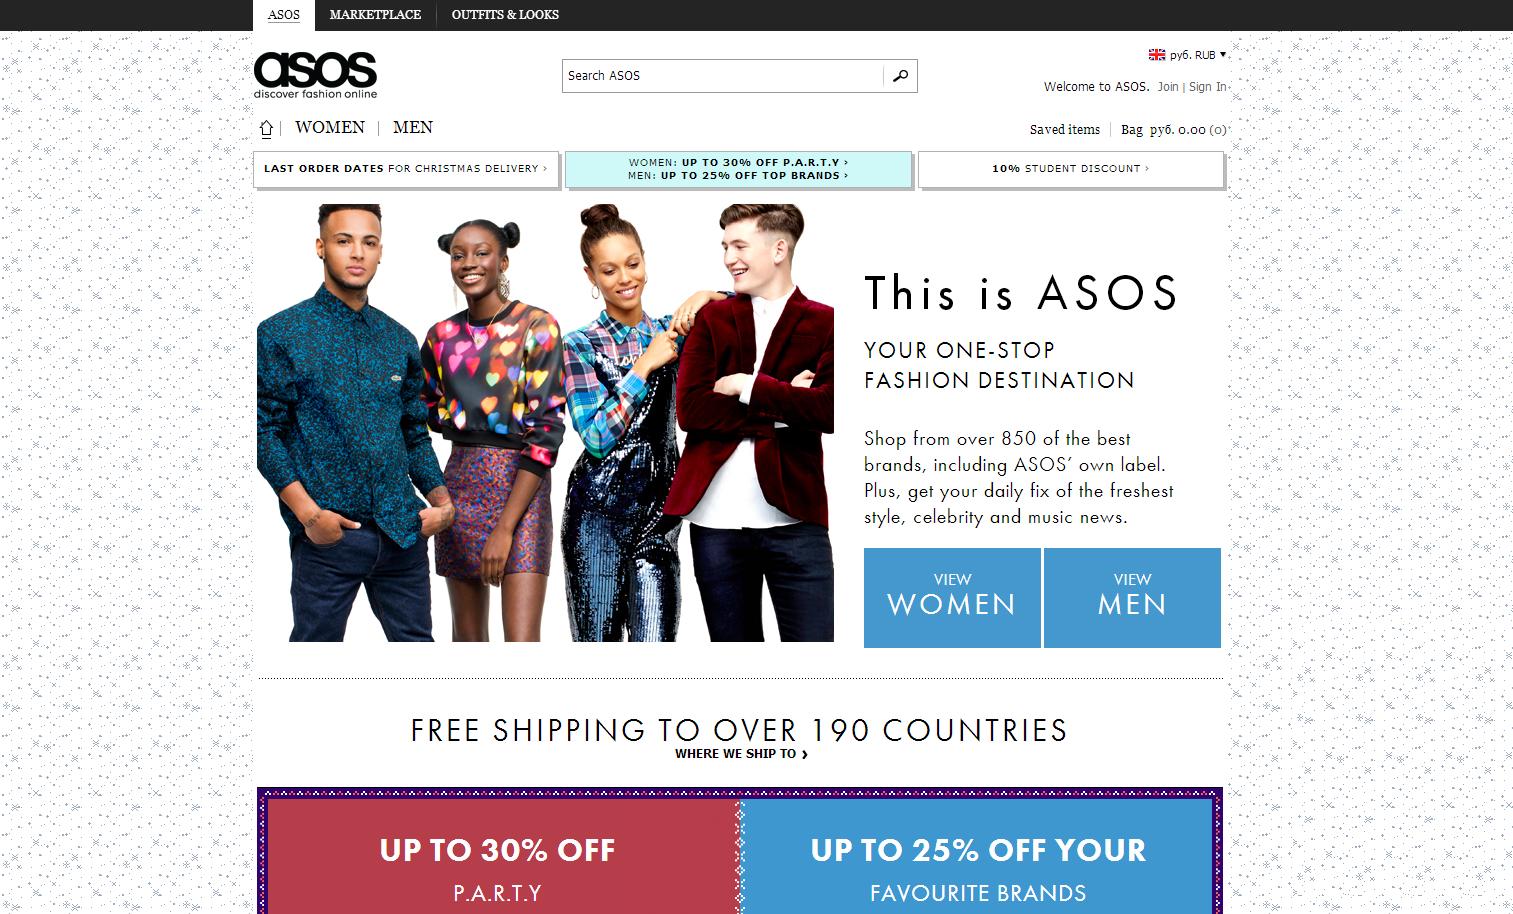 f2db4978d98b Дизайн сайта интернет-магазина одежды, вариант 2